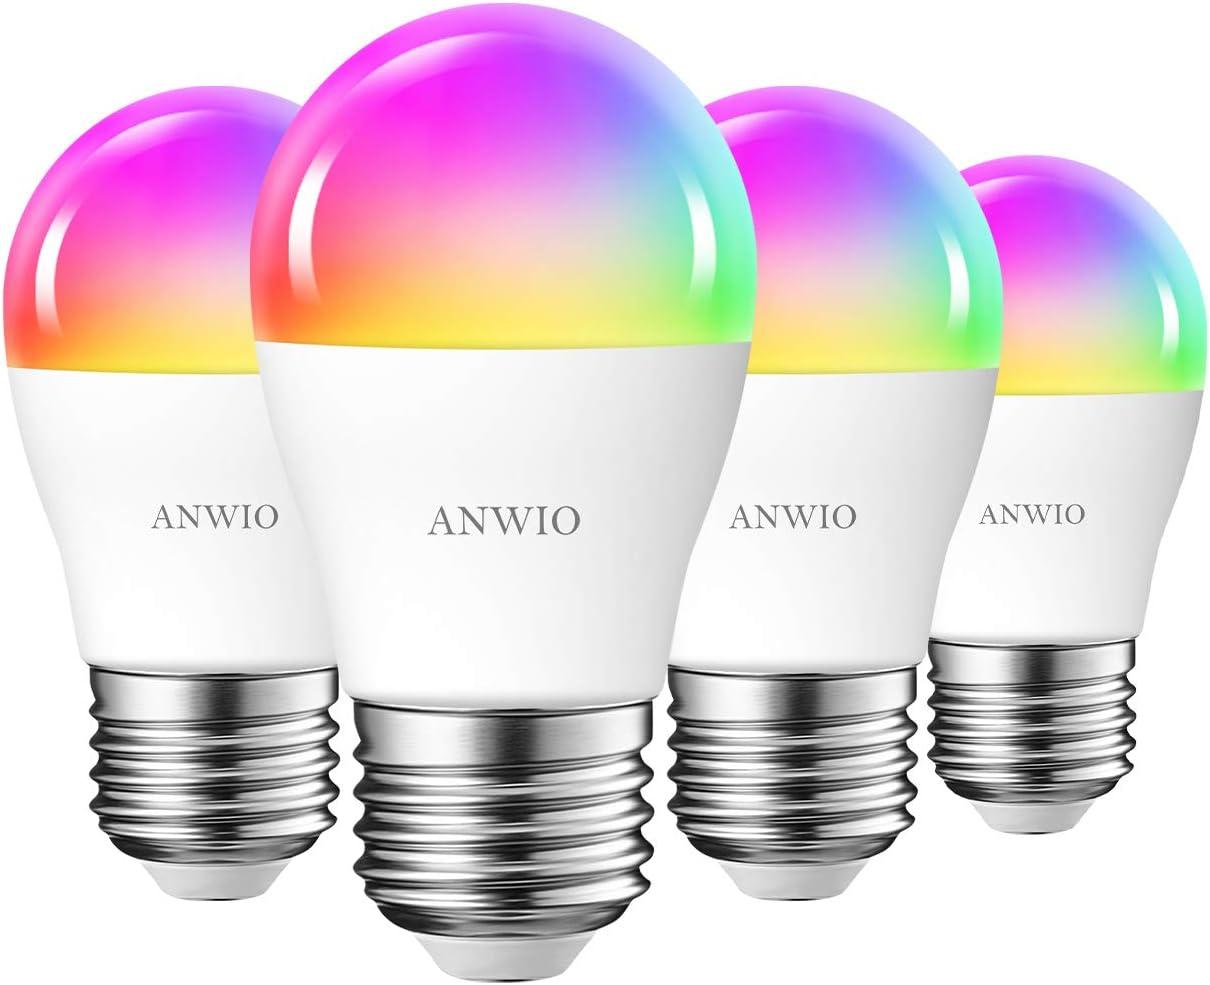 Warmwei/ß 2 St/ücke ANWIO Smart WLAN Gl/ühbirne E27 5W 470LM intelligente Bluetooth Lampe Dimmbare Mehrfarbige LED Birne 2700K-6500K kompatibel mit Alexa Google Home und Echo Dot